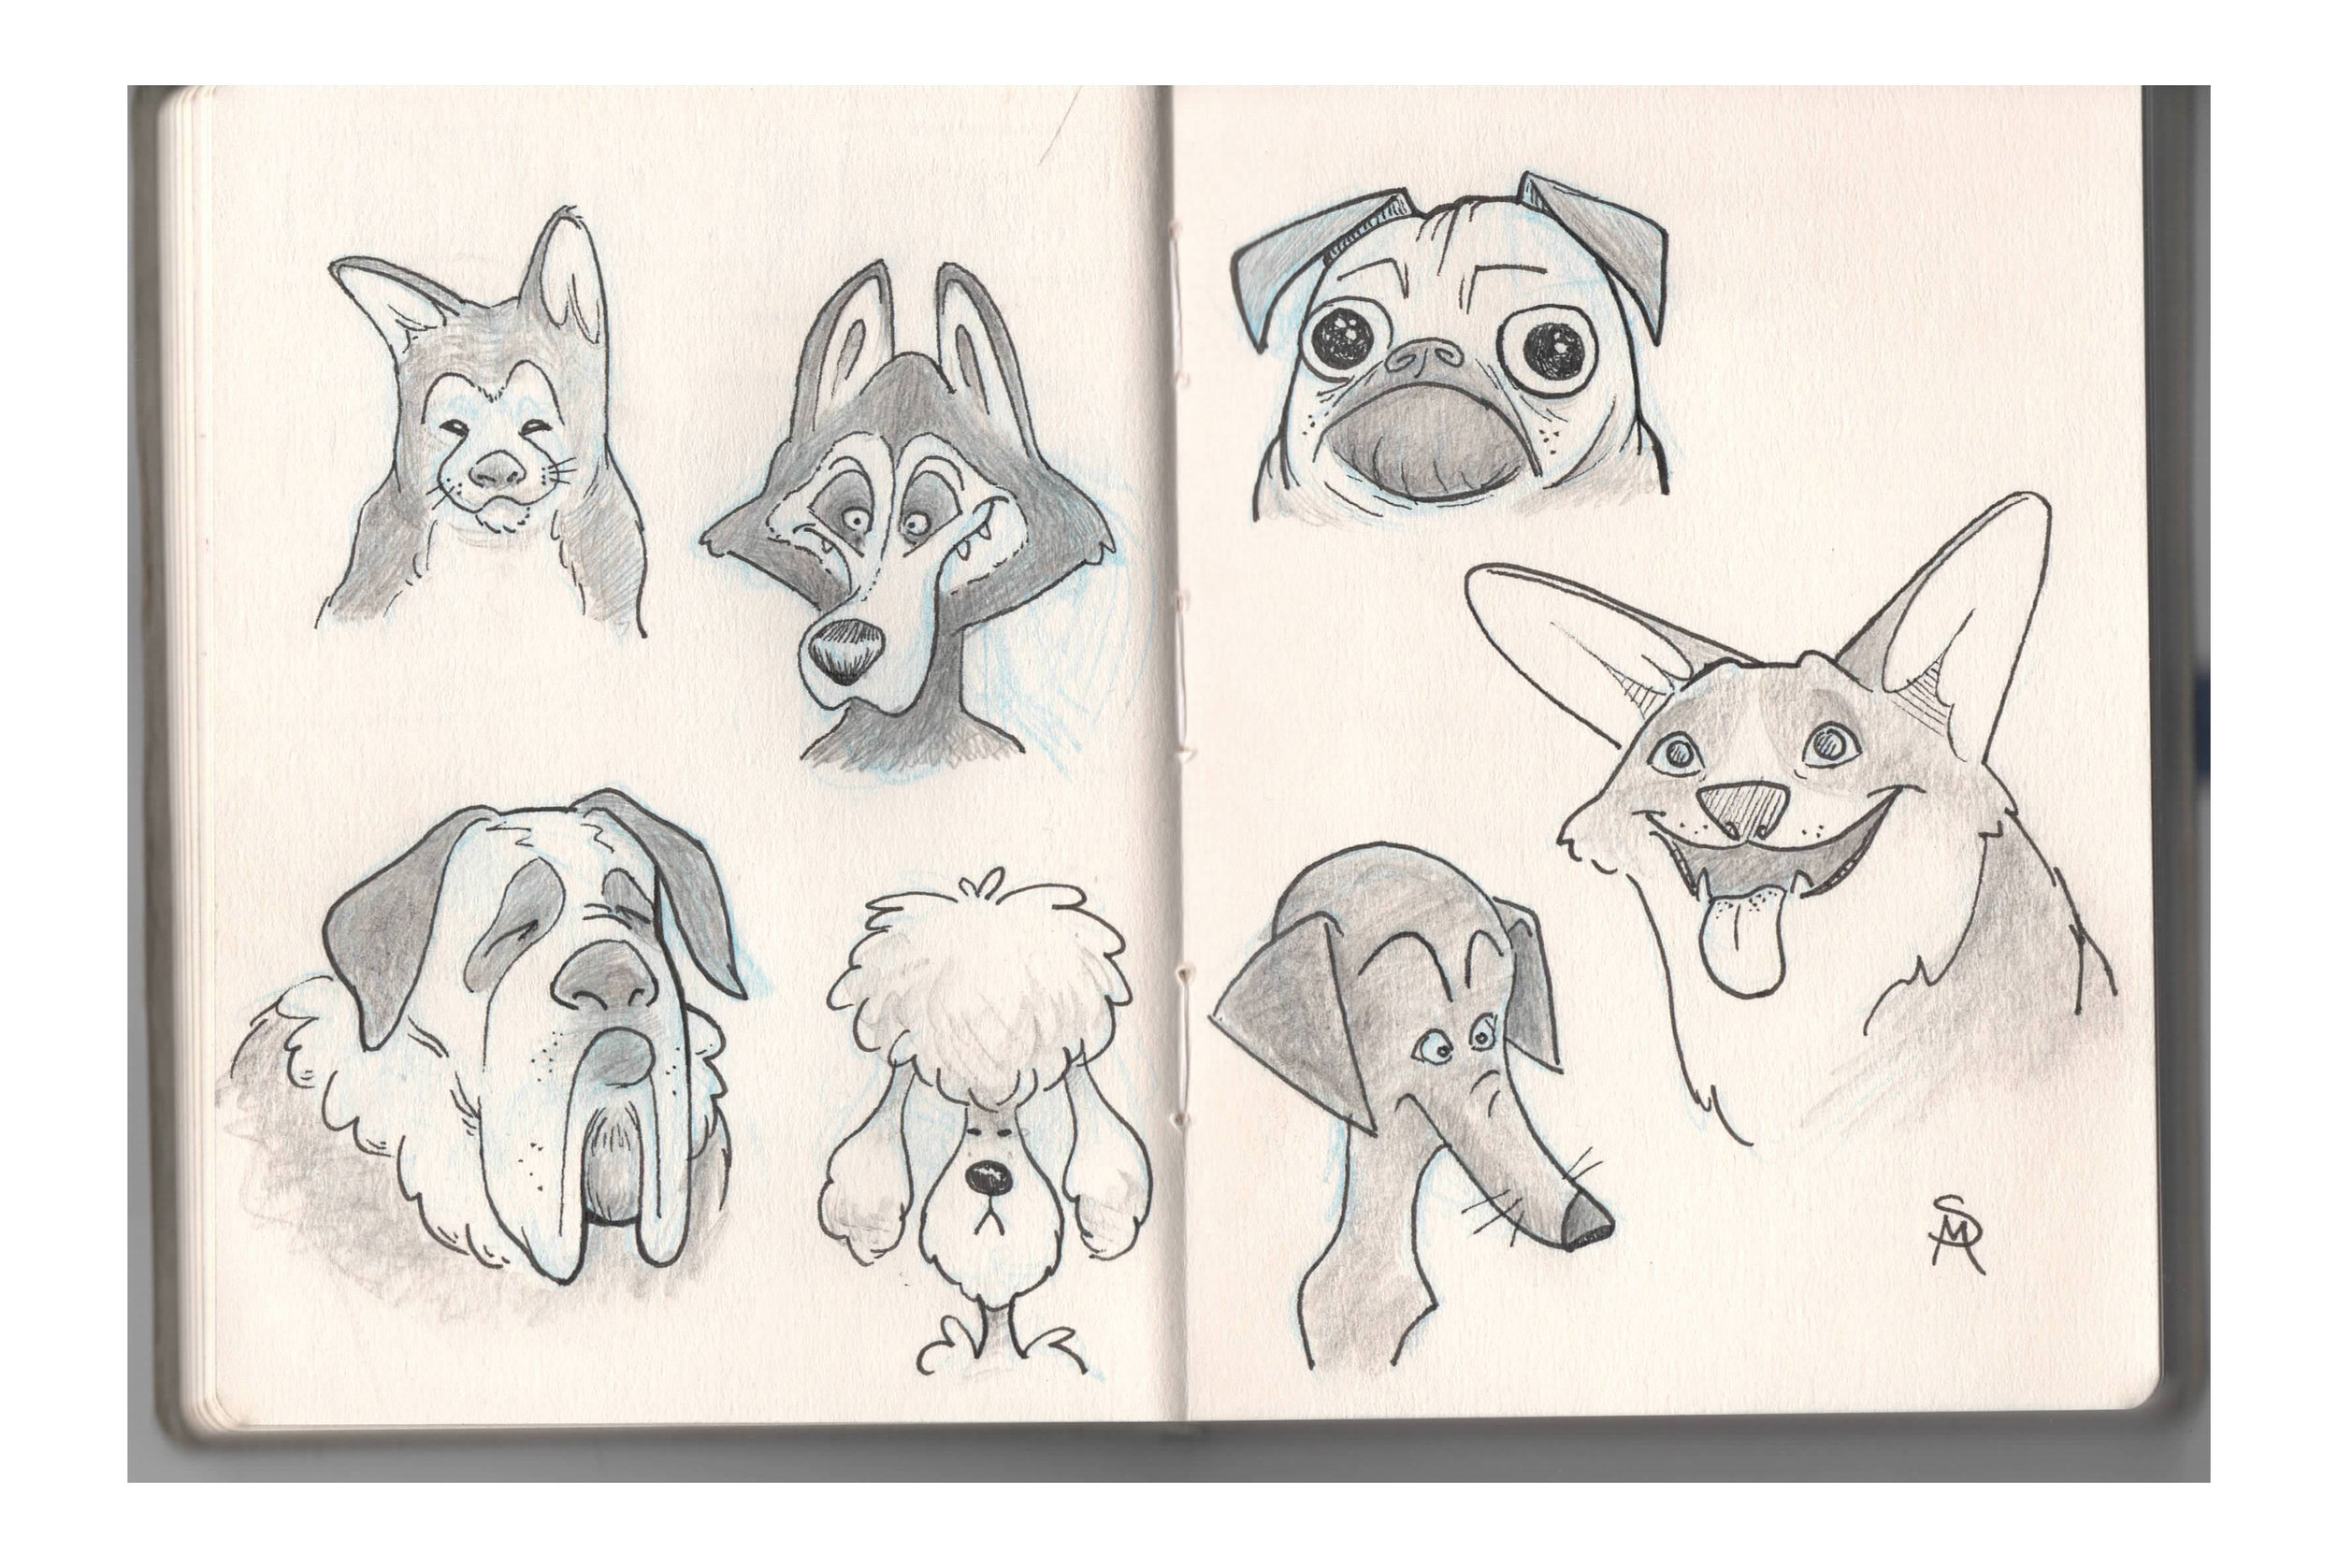 dogs_scanSmall_112817.jpg